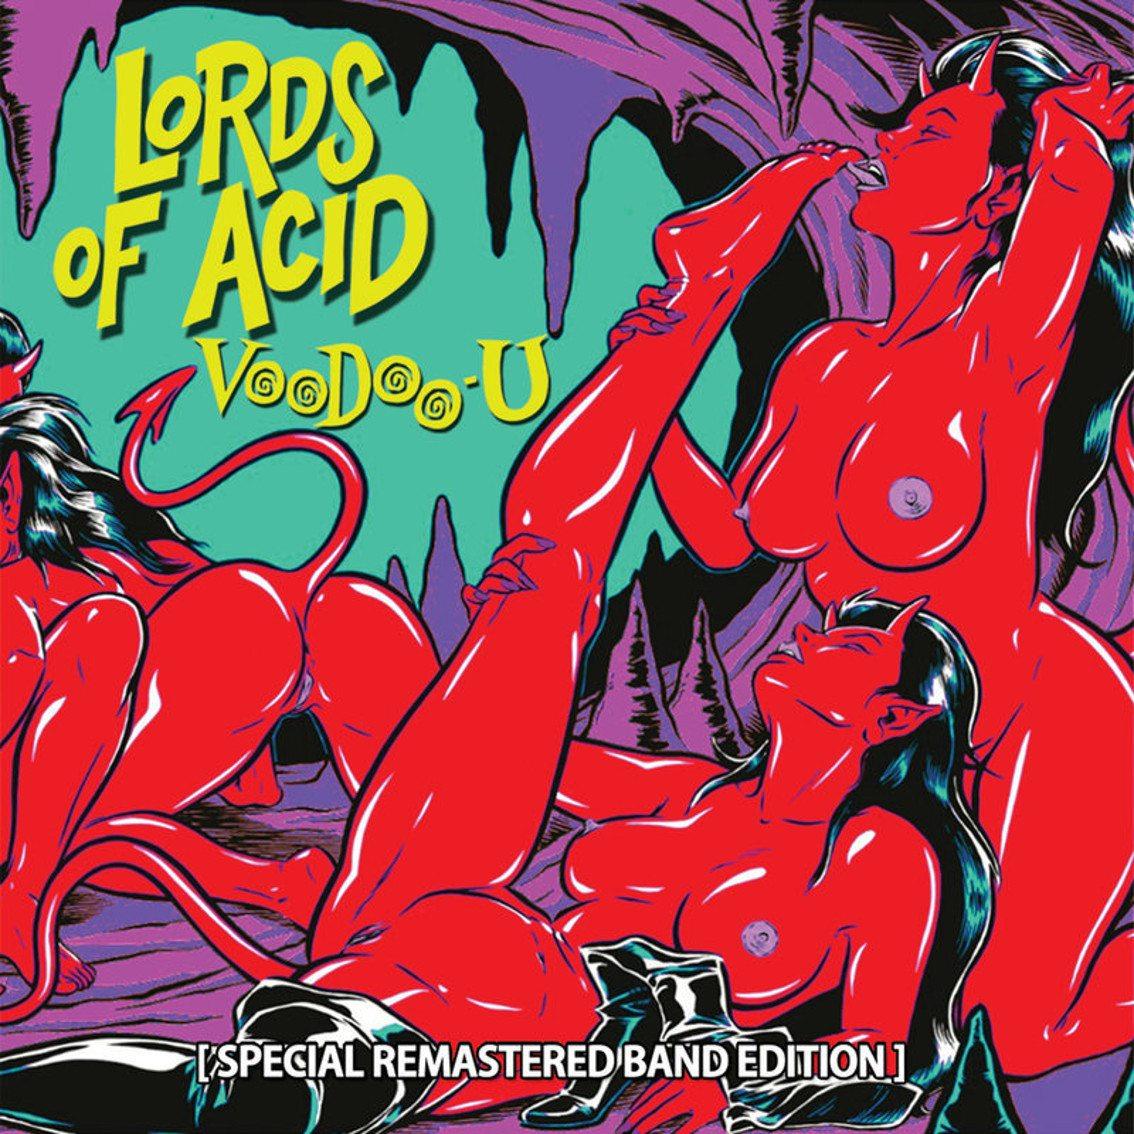 Lords of Acid see'Voodoo-U' reissued with lots of bonus tracks on CD and double vinyl